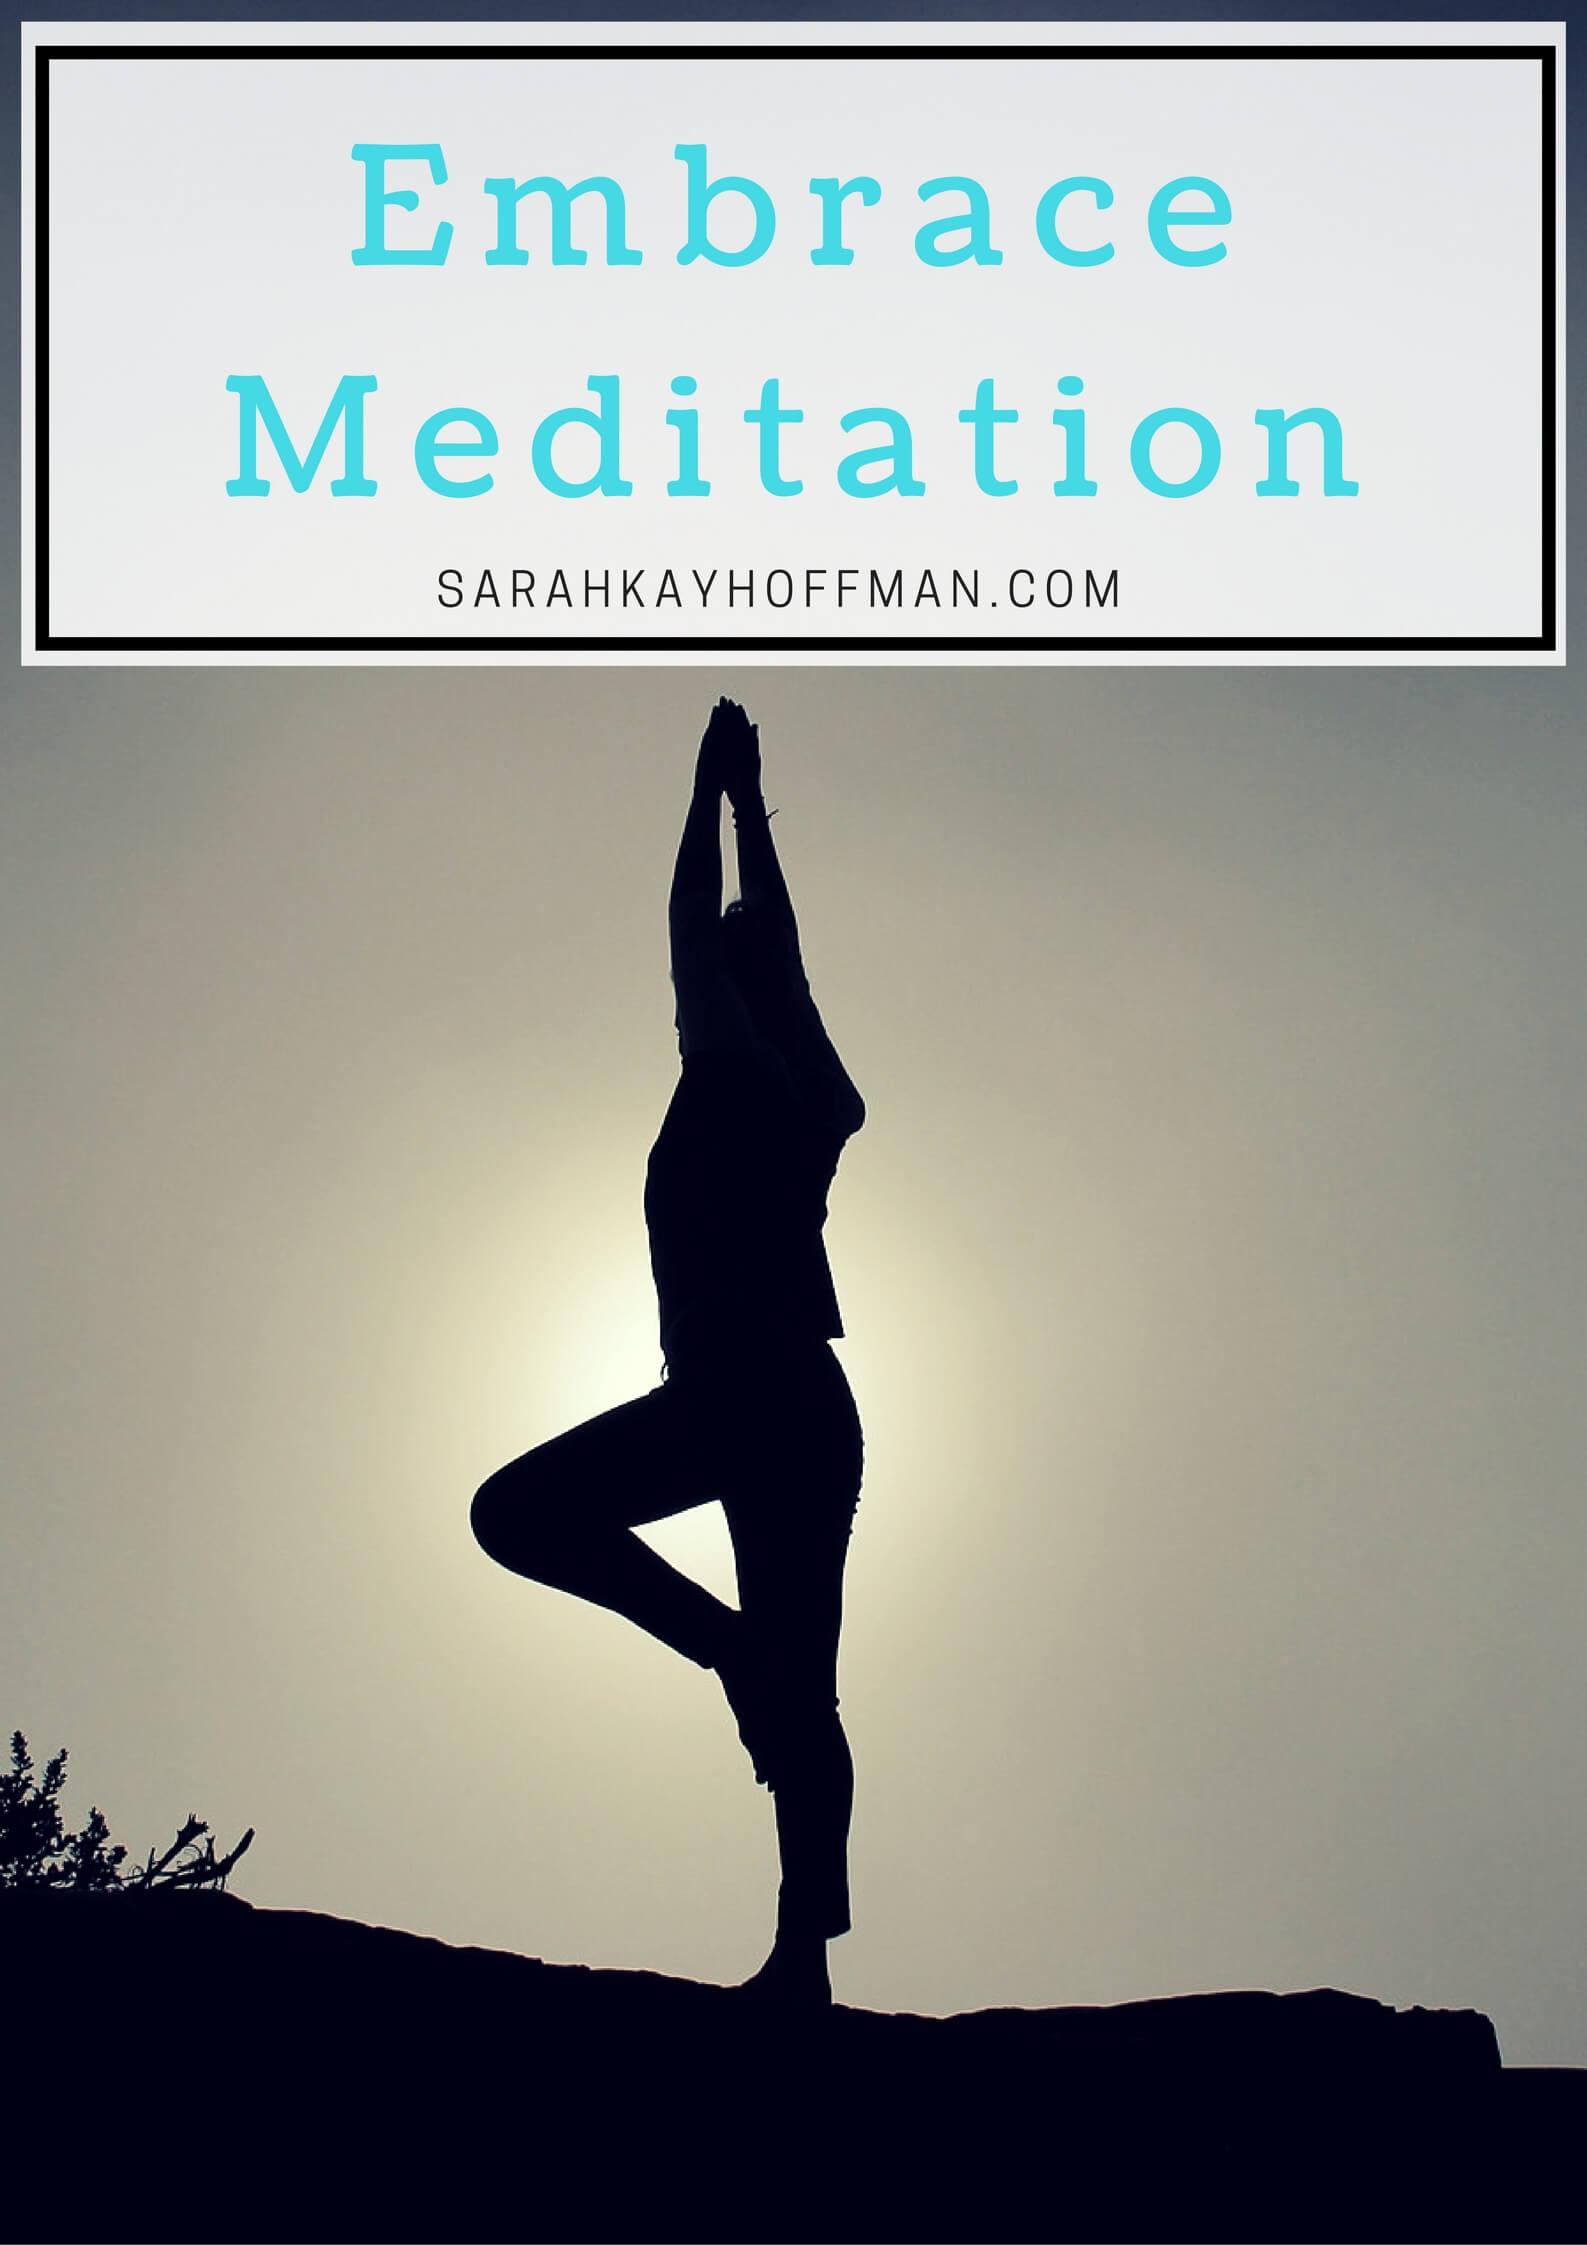 Embrace Meditation sarahkayhoffman.com